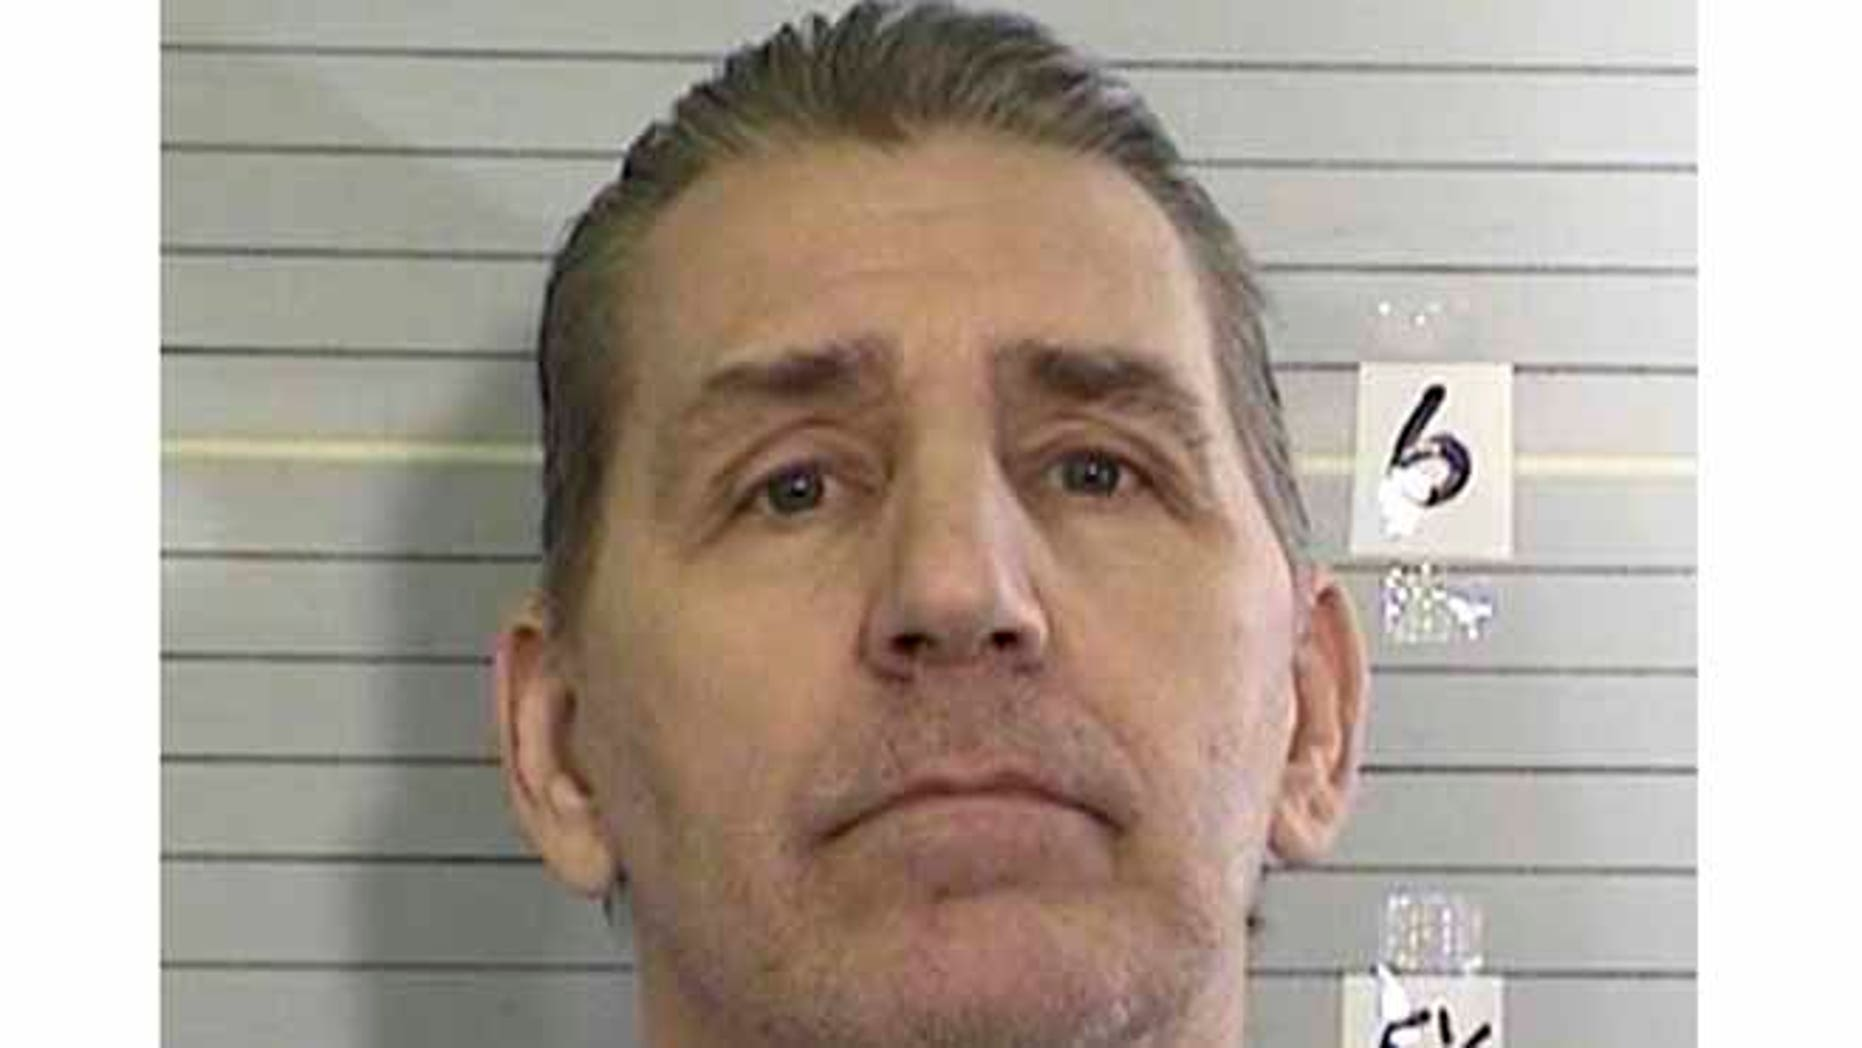 Photo of William Richards in prison. (California Department of Corrections and Rehabilitation via AP)